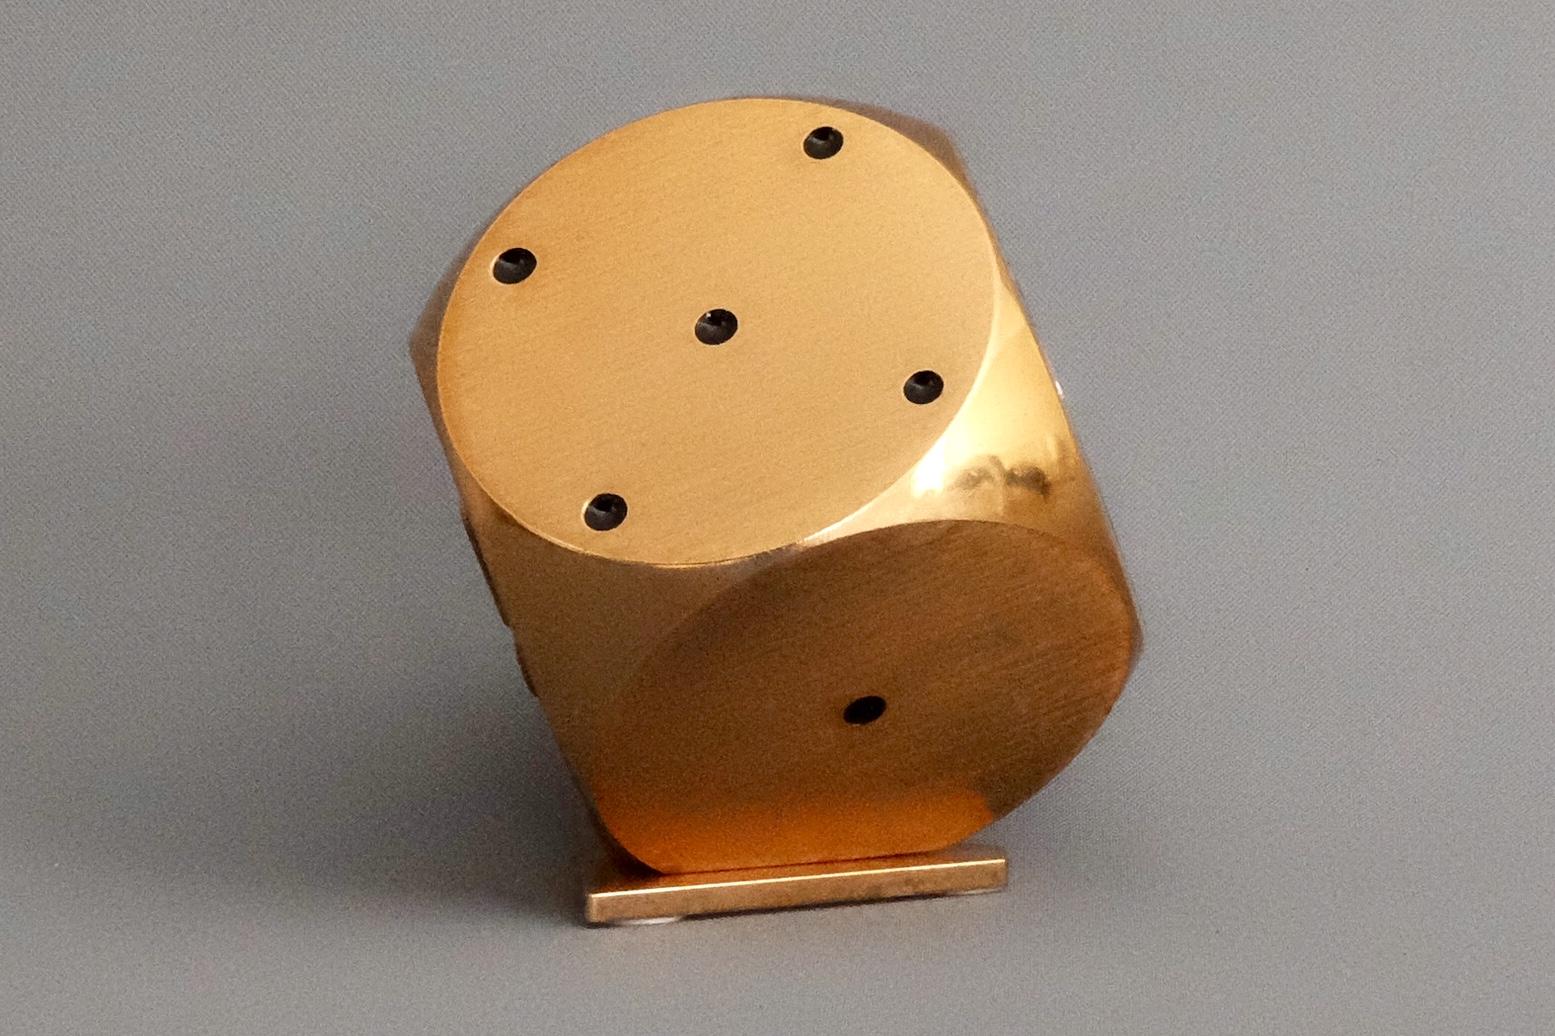 Imhof Gold Dice Motif Desk Eight Day Swiss Alarm Clock